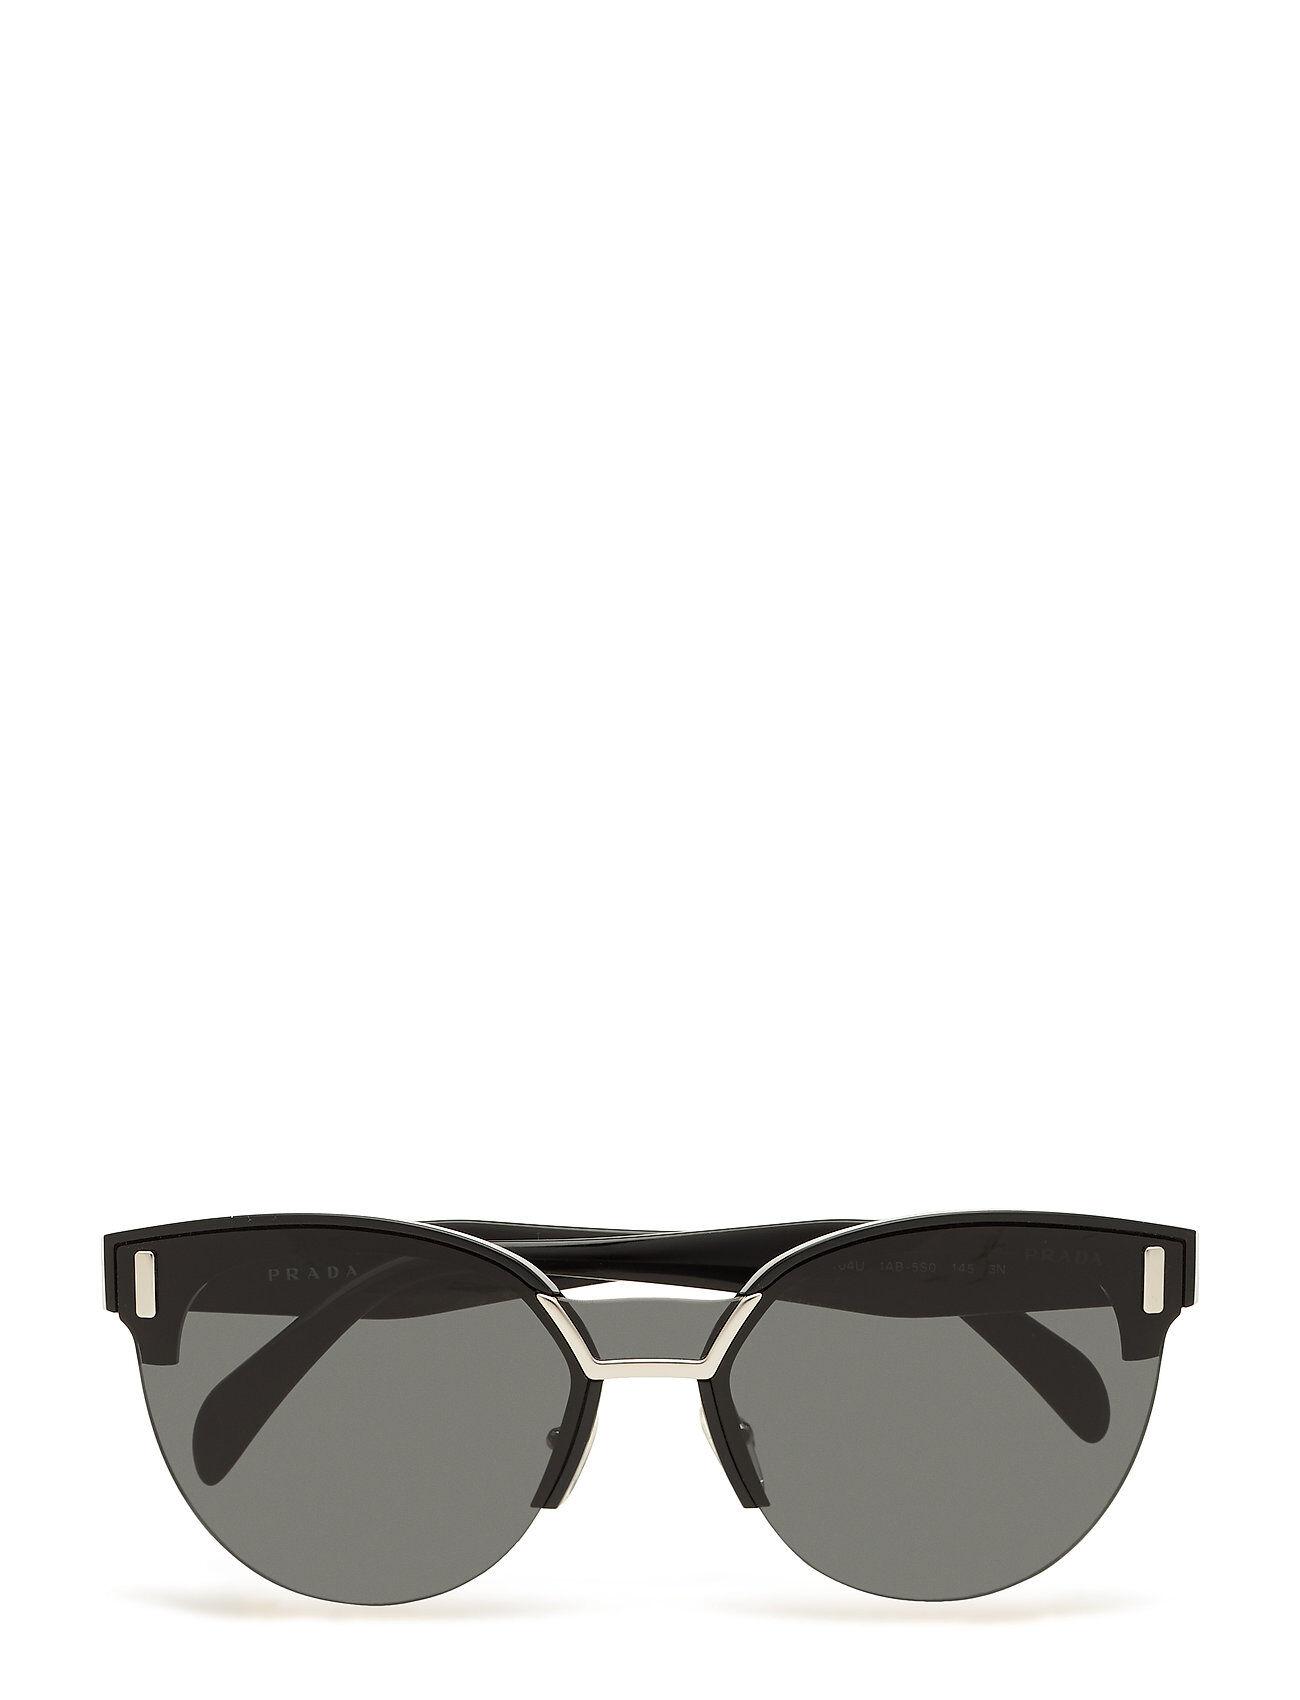 Image of Prada Sunglasses Aurinkolasit Musta